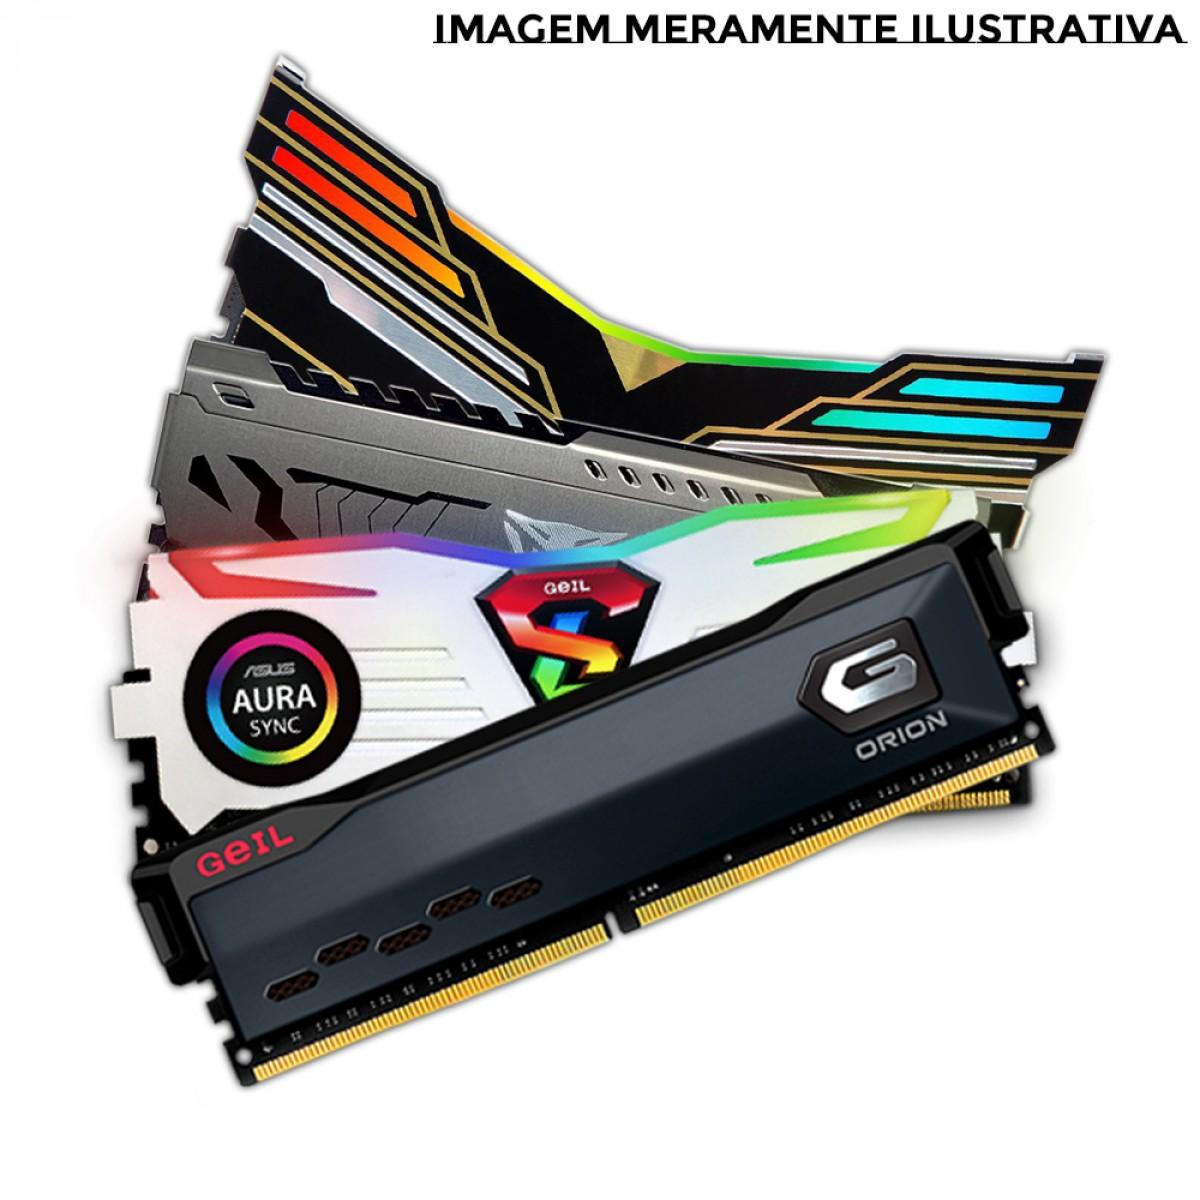 Kit Upgrade, AMD Ryzen 3 PRO 4350G, Asus TUF GAMING B450M-PLUS II, Memória DDR4 16GB (2x8GB) 3000MHz